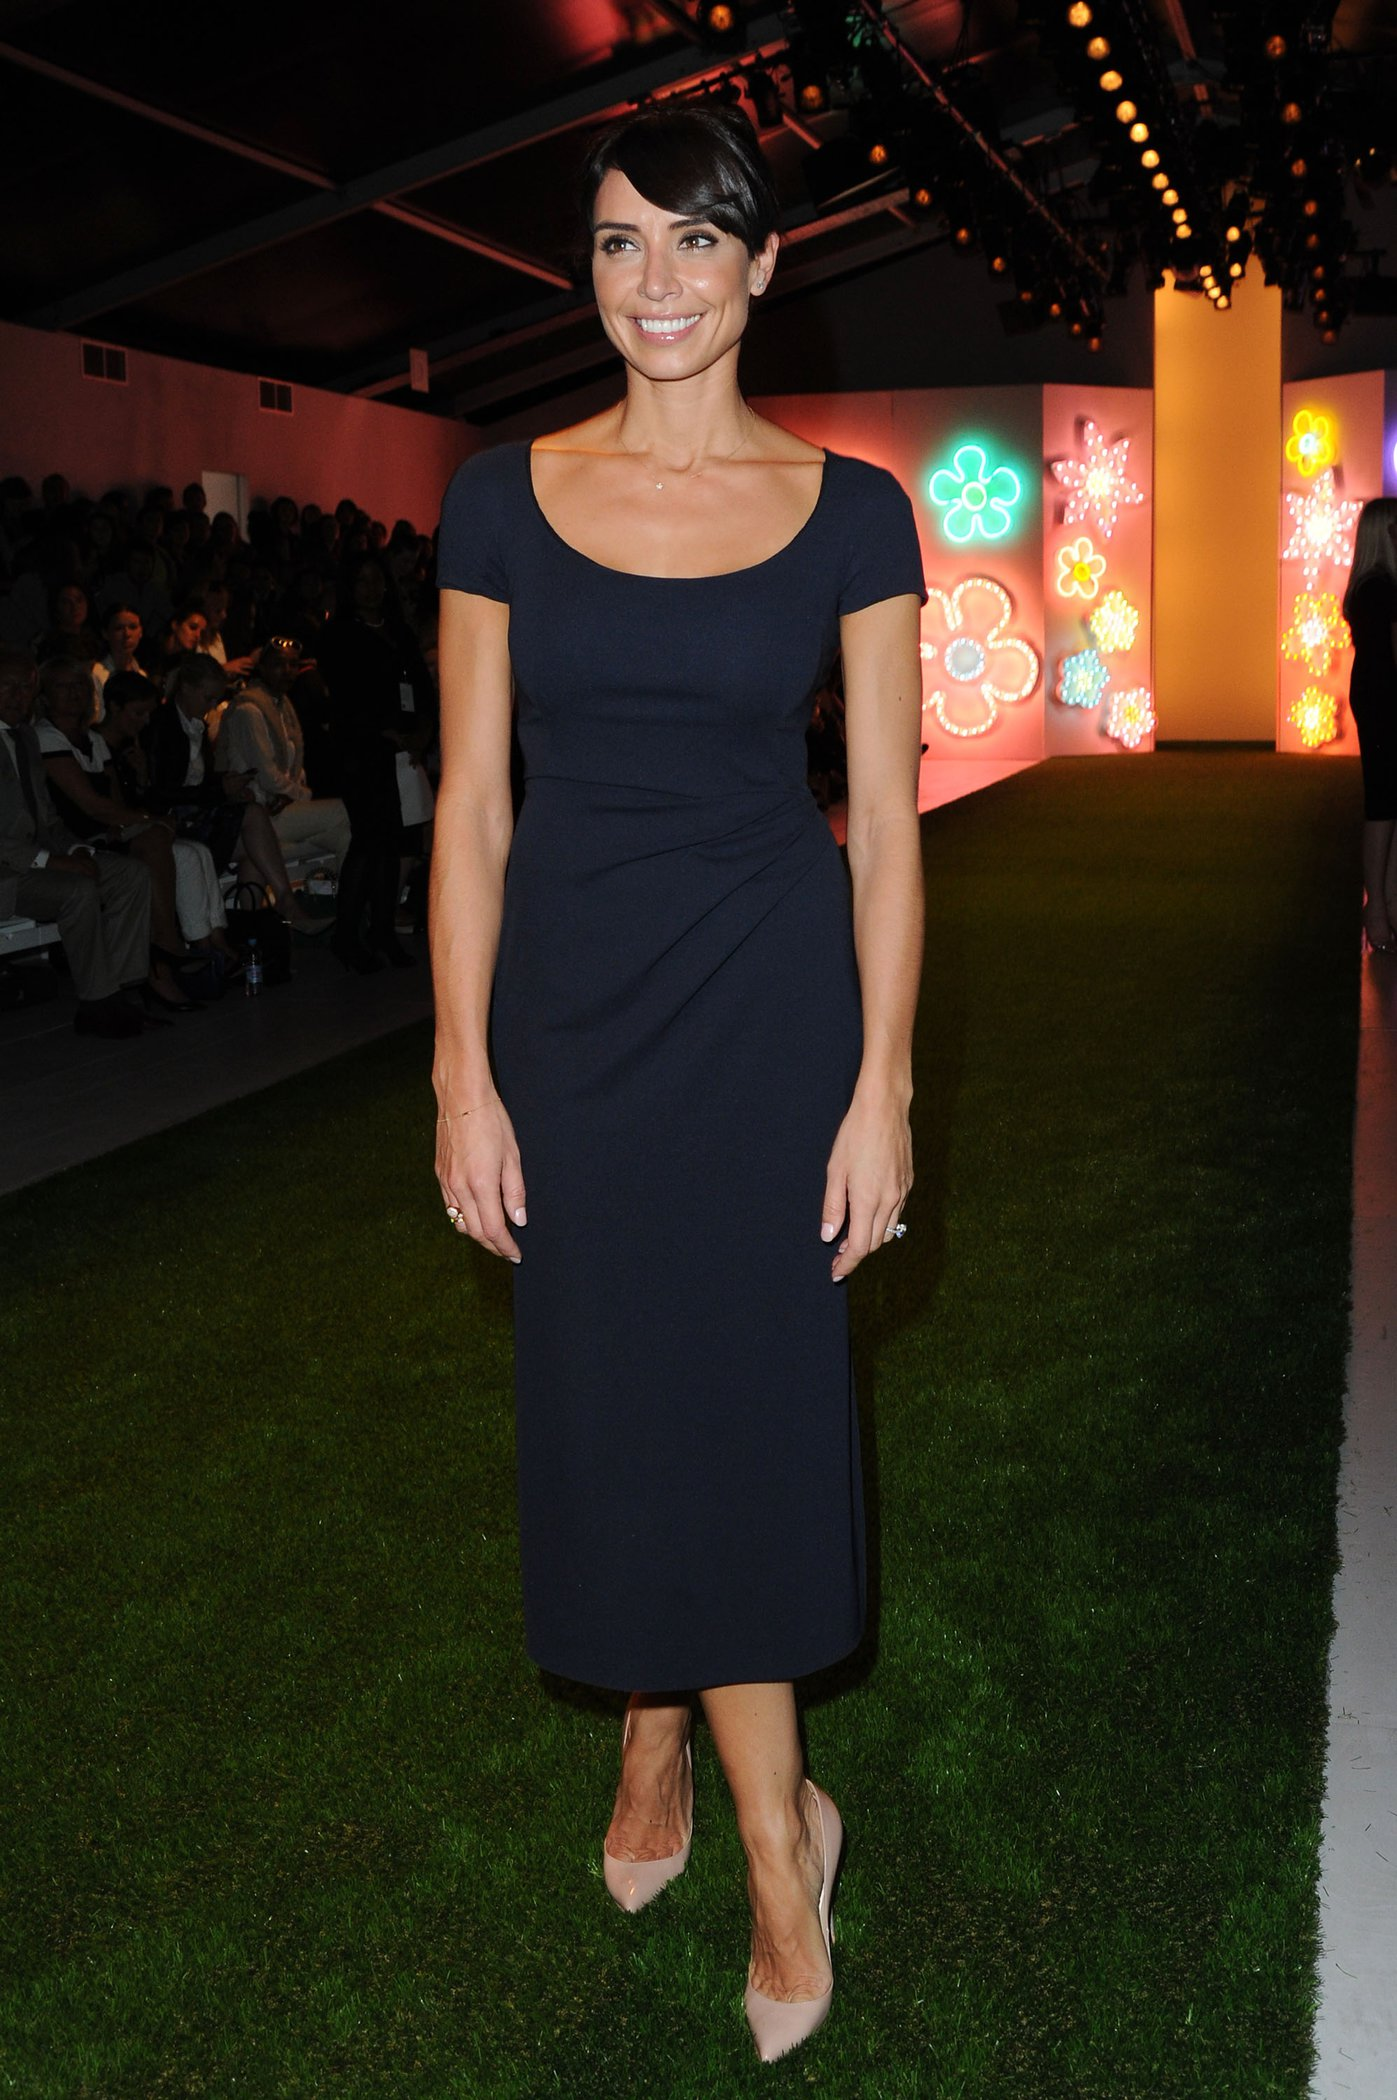 Christine Bleakley - Jasper Conran Collection - September 15, 2012